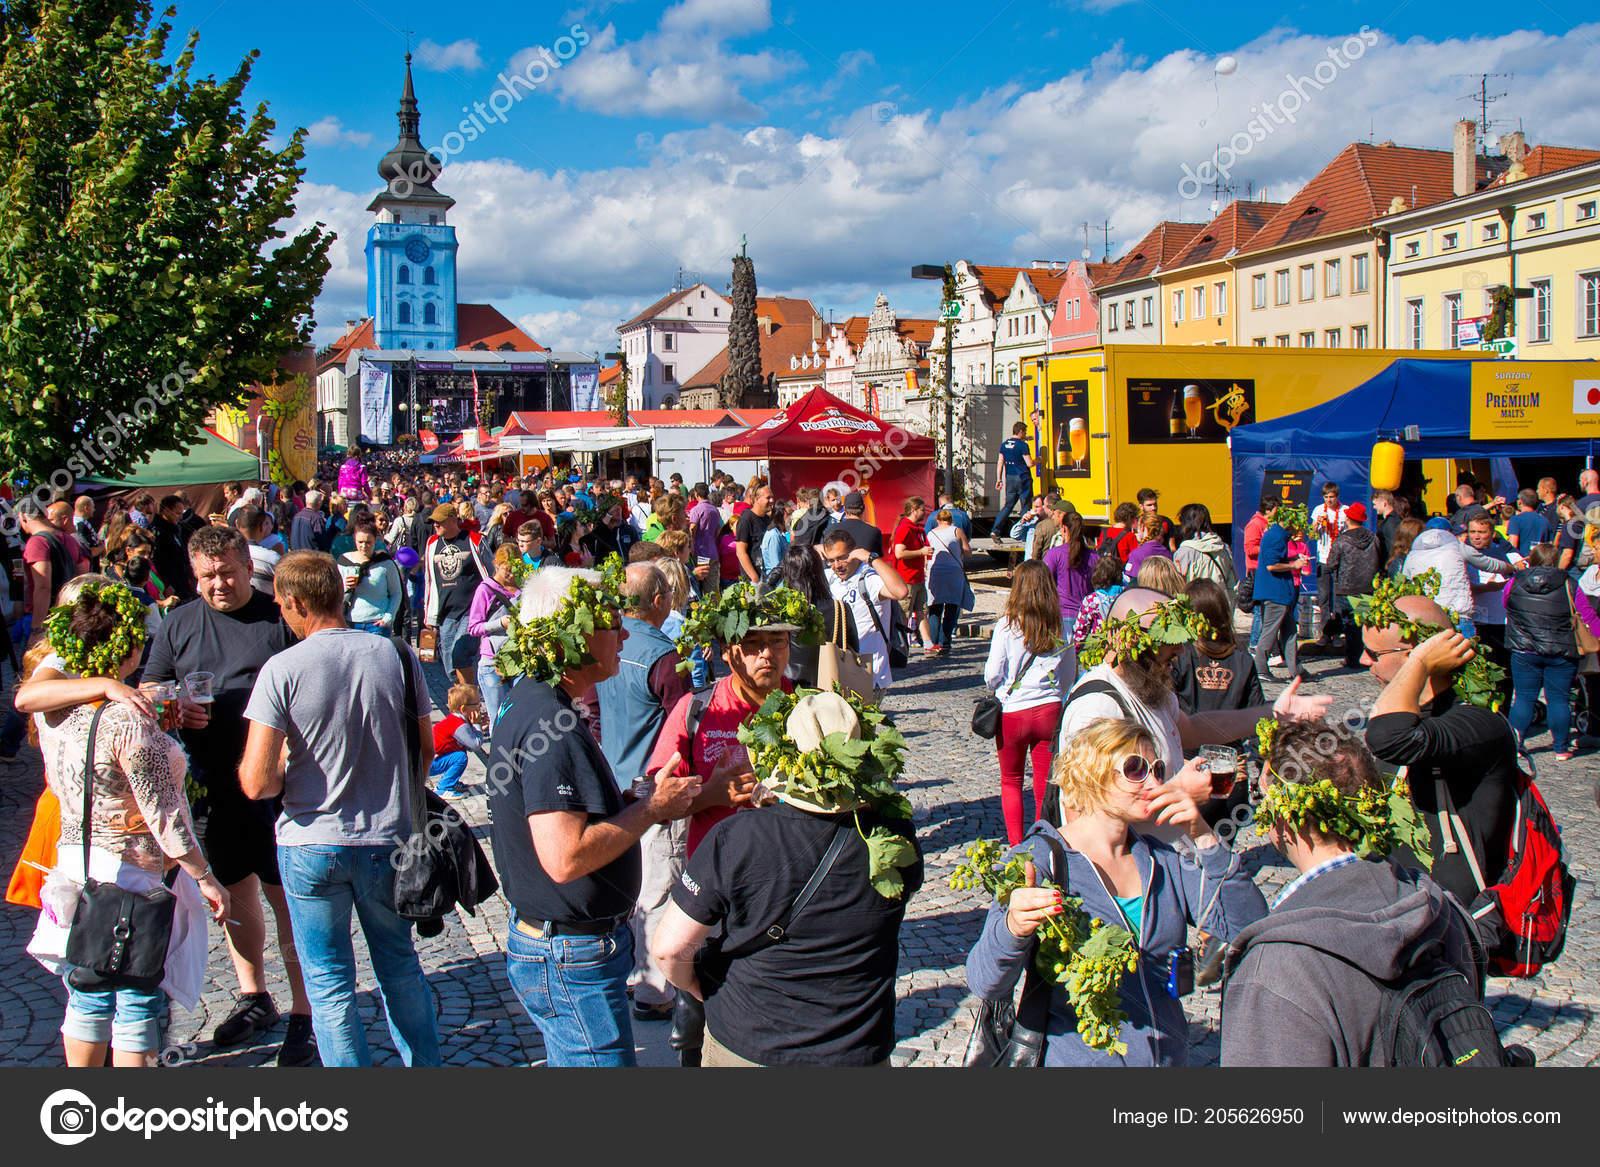 zatec town czech republic september 2015 people hops wreath head